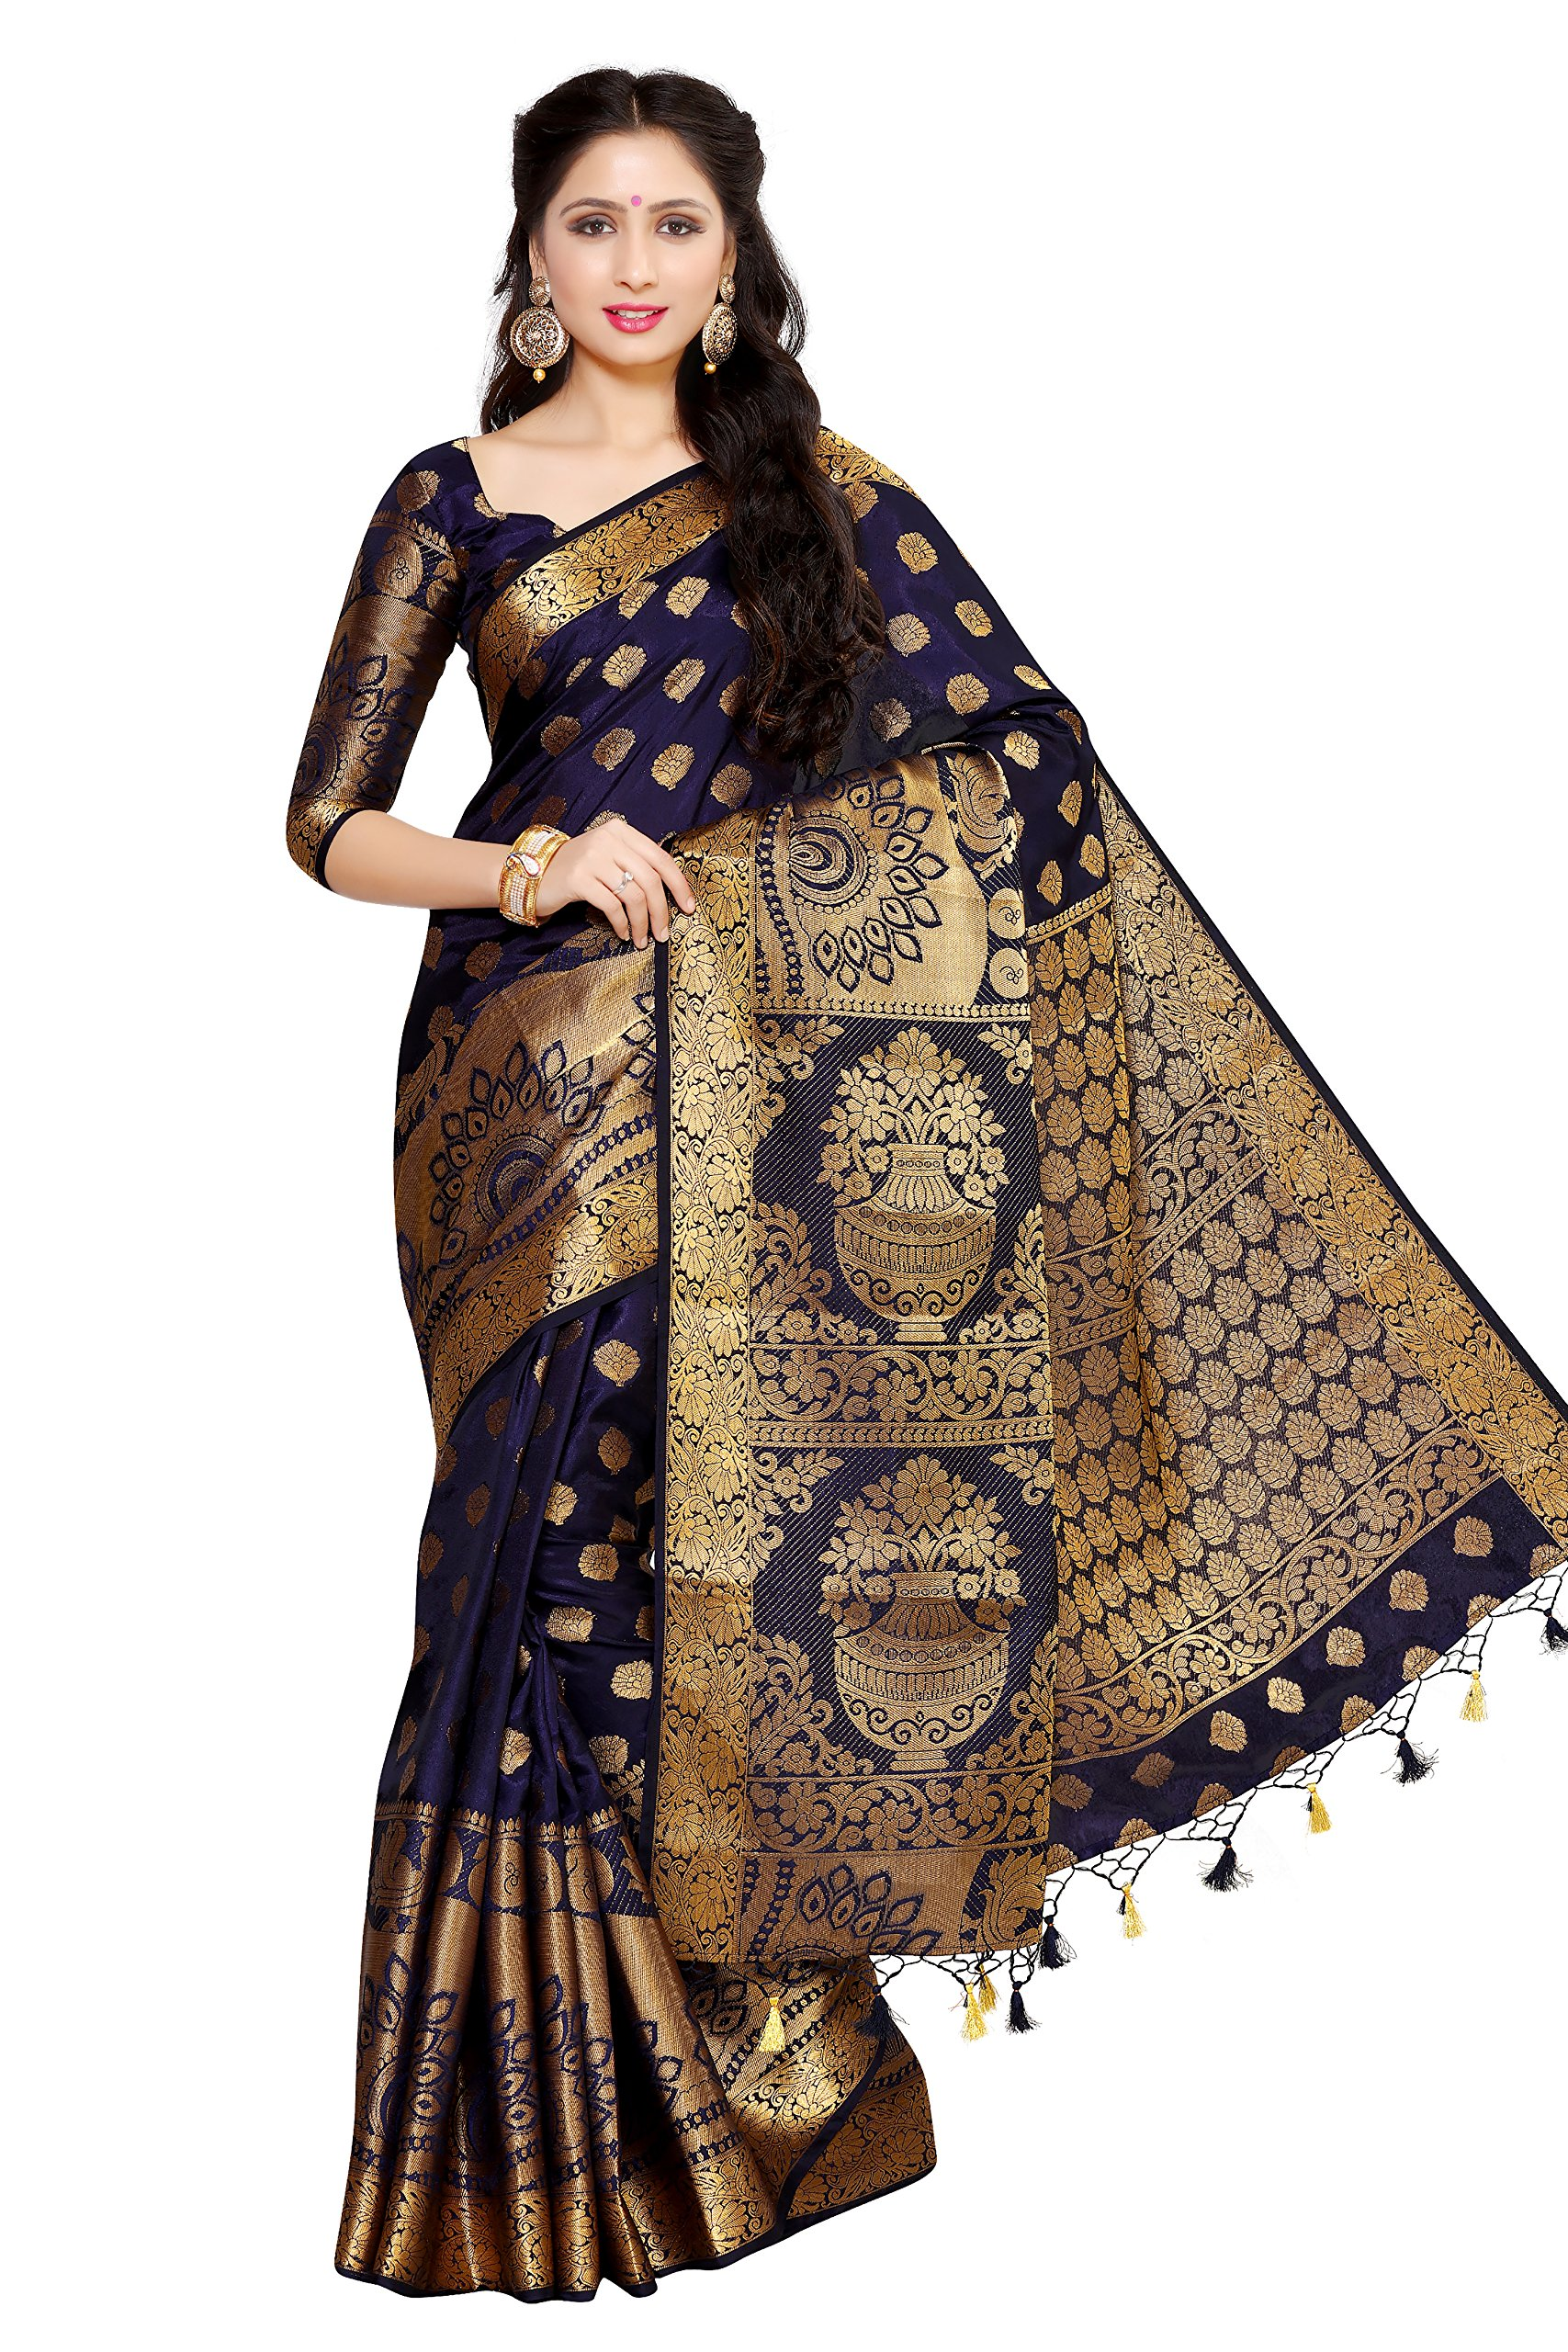 549b3493e20cc6 Mimosa Women's Art Silk Saree With Blouse Piece (4050-241-Sd-Nvy,Navy  Blue,Free Size) - Gia Designer